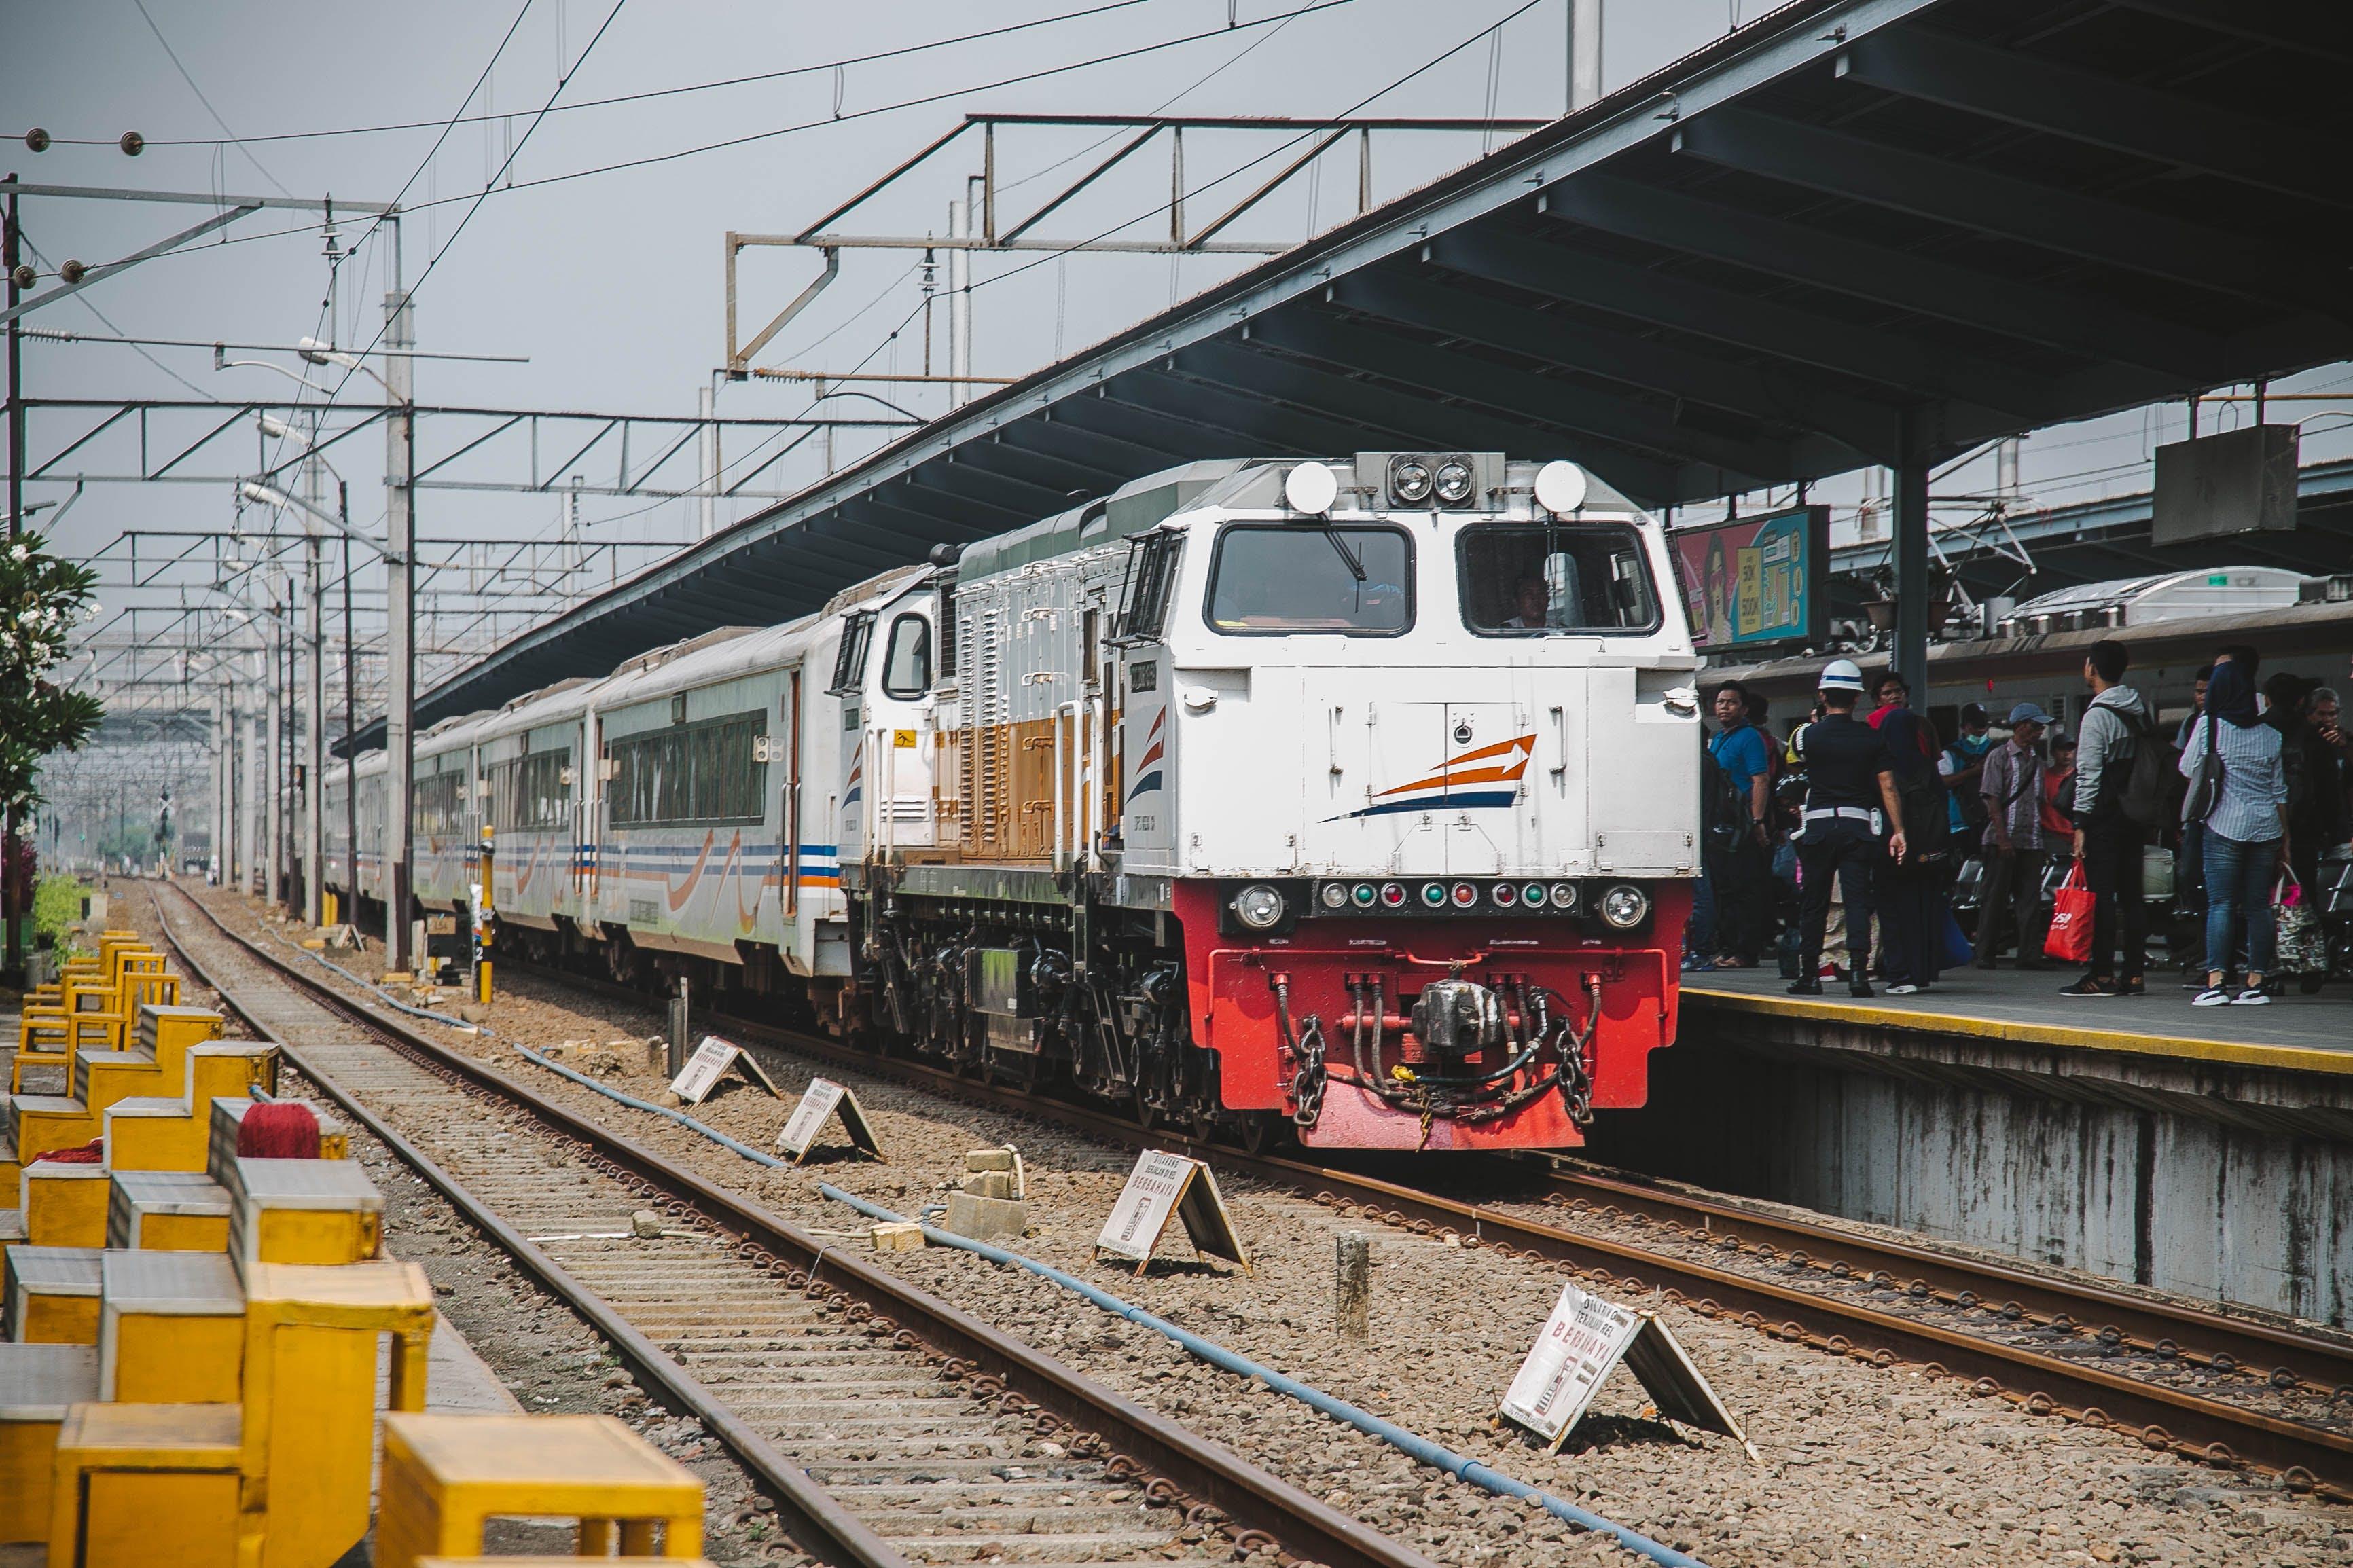 Free stock photo of trains